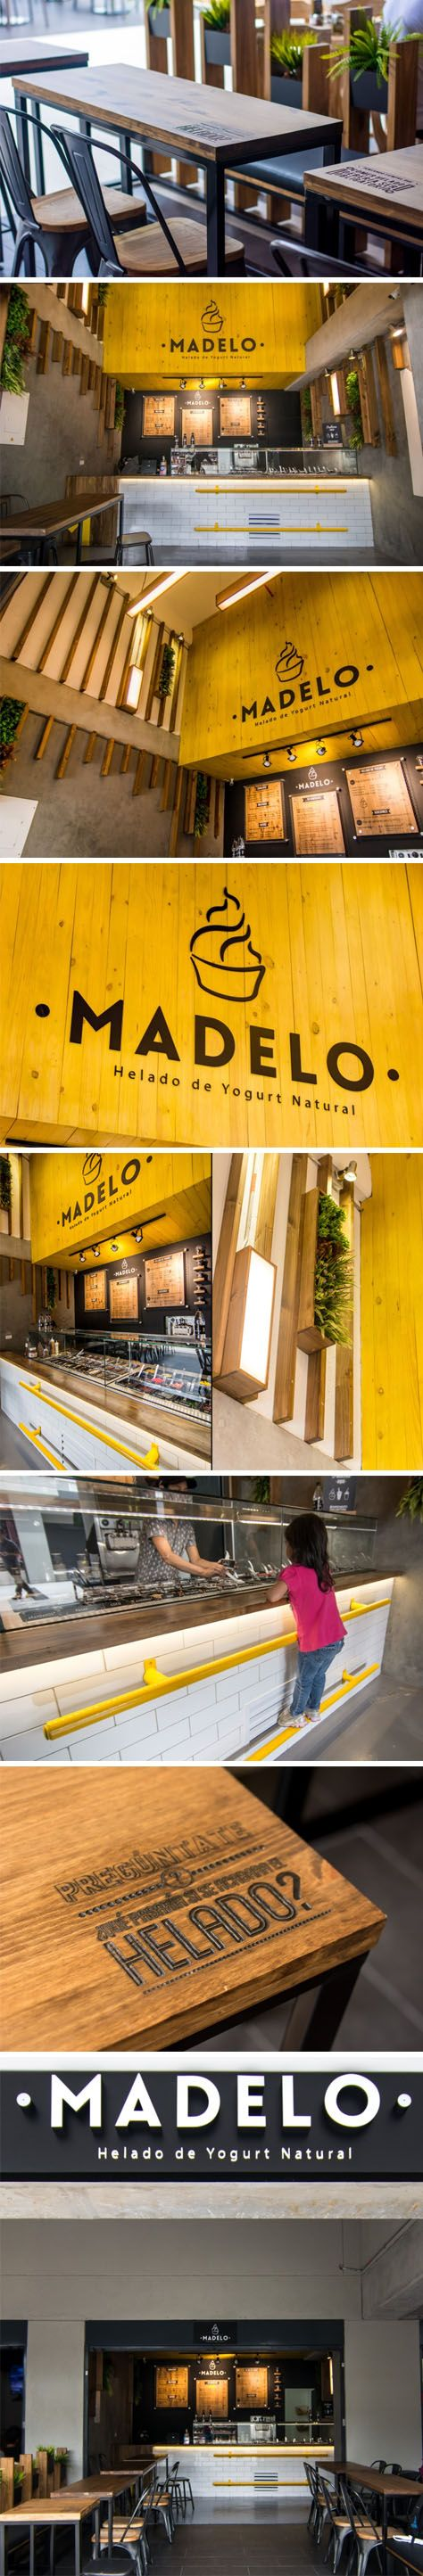 Madelo frozen yogurt shop by Blaster, Medellín – Colombia.